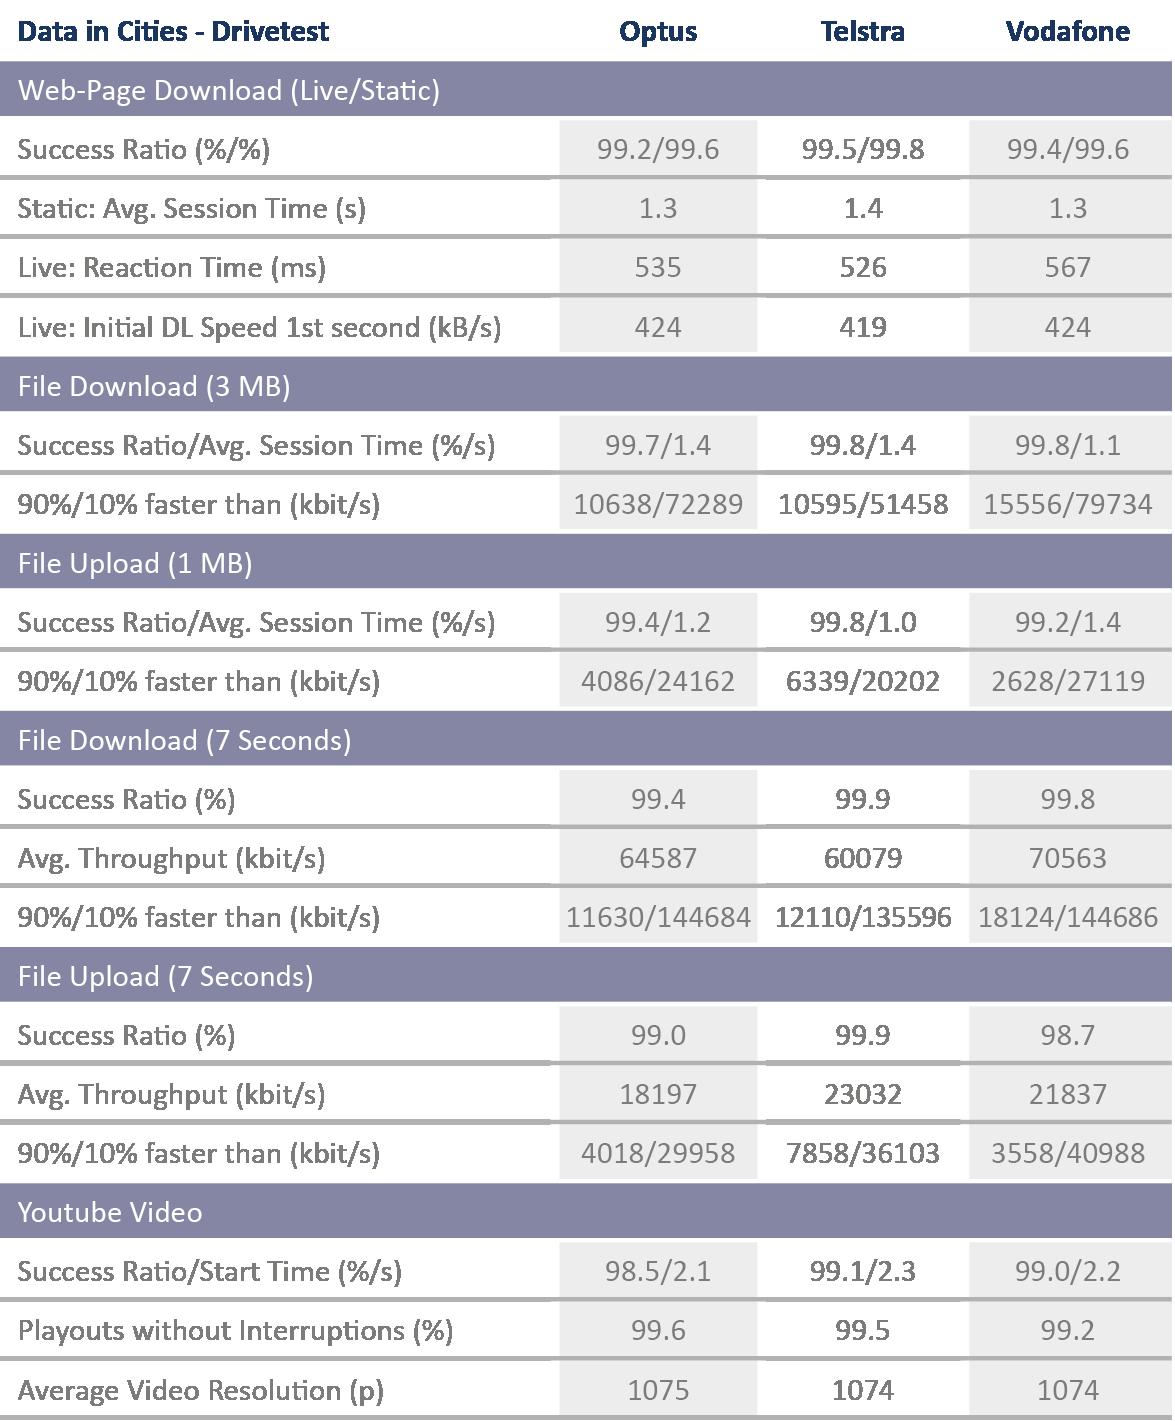 AUS_Tabelle_DataCities_Drivetest_2017_Strich.png